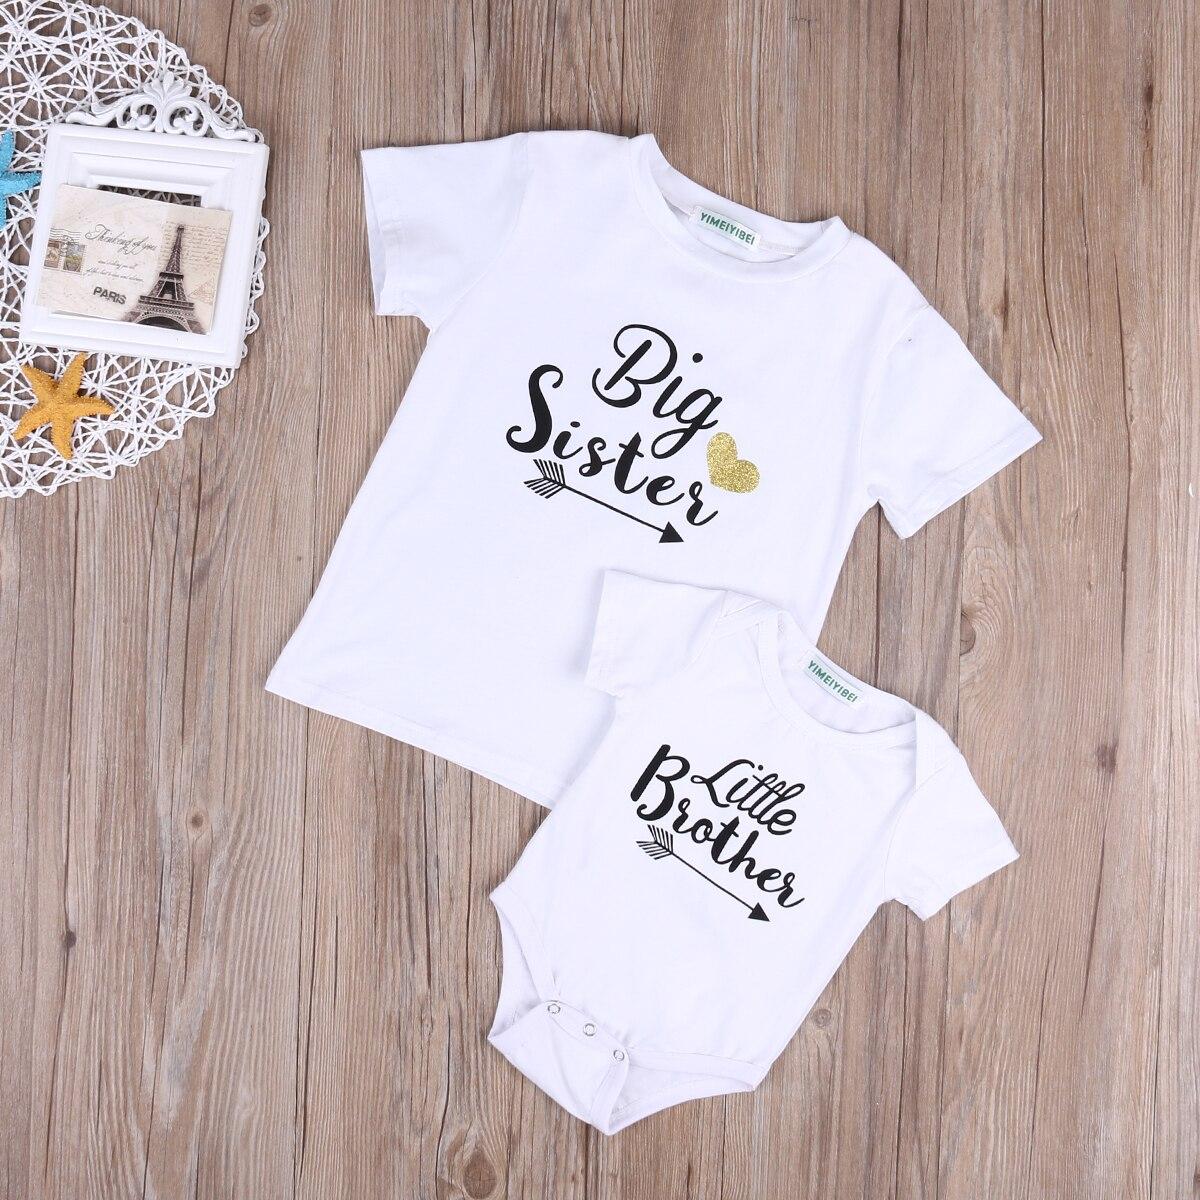 Newborn Baby Little Brother Romper Big Sister T Shirt -8803